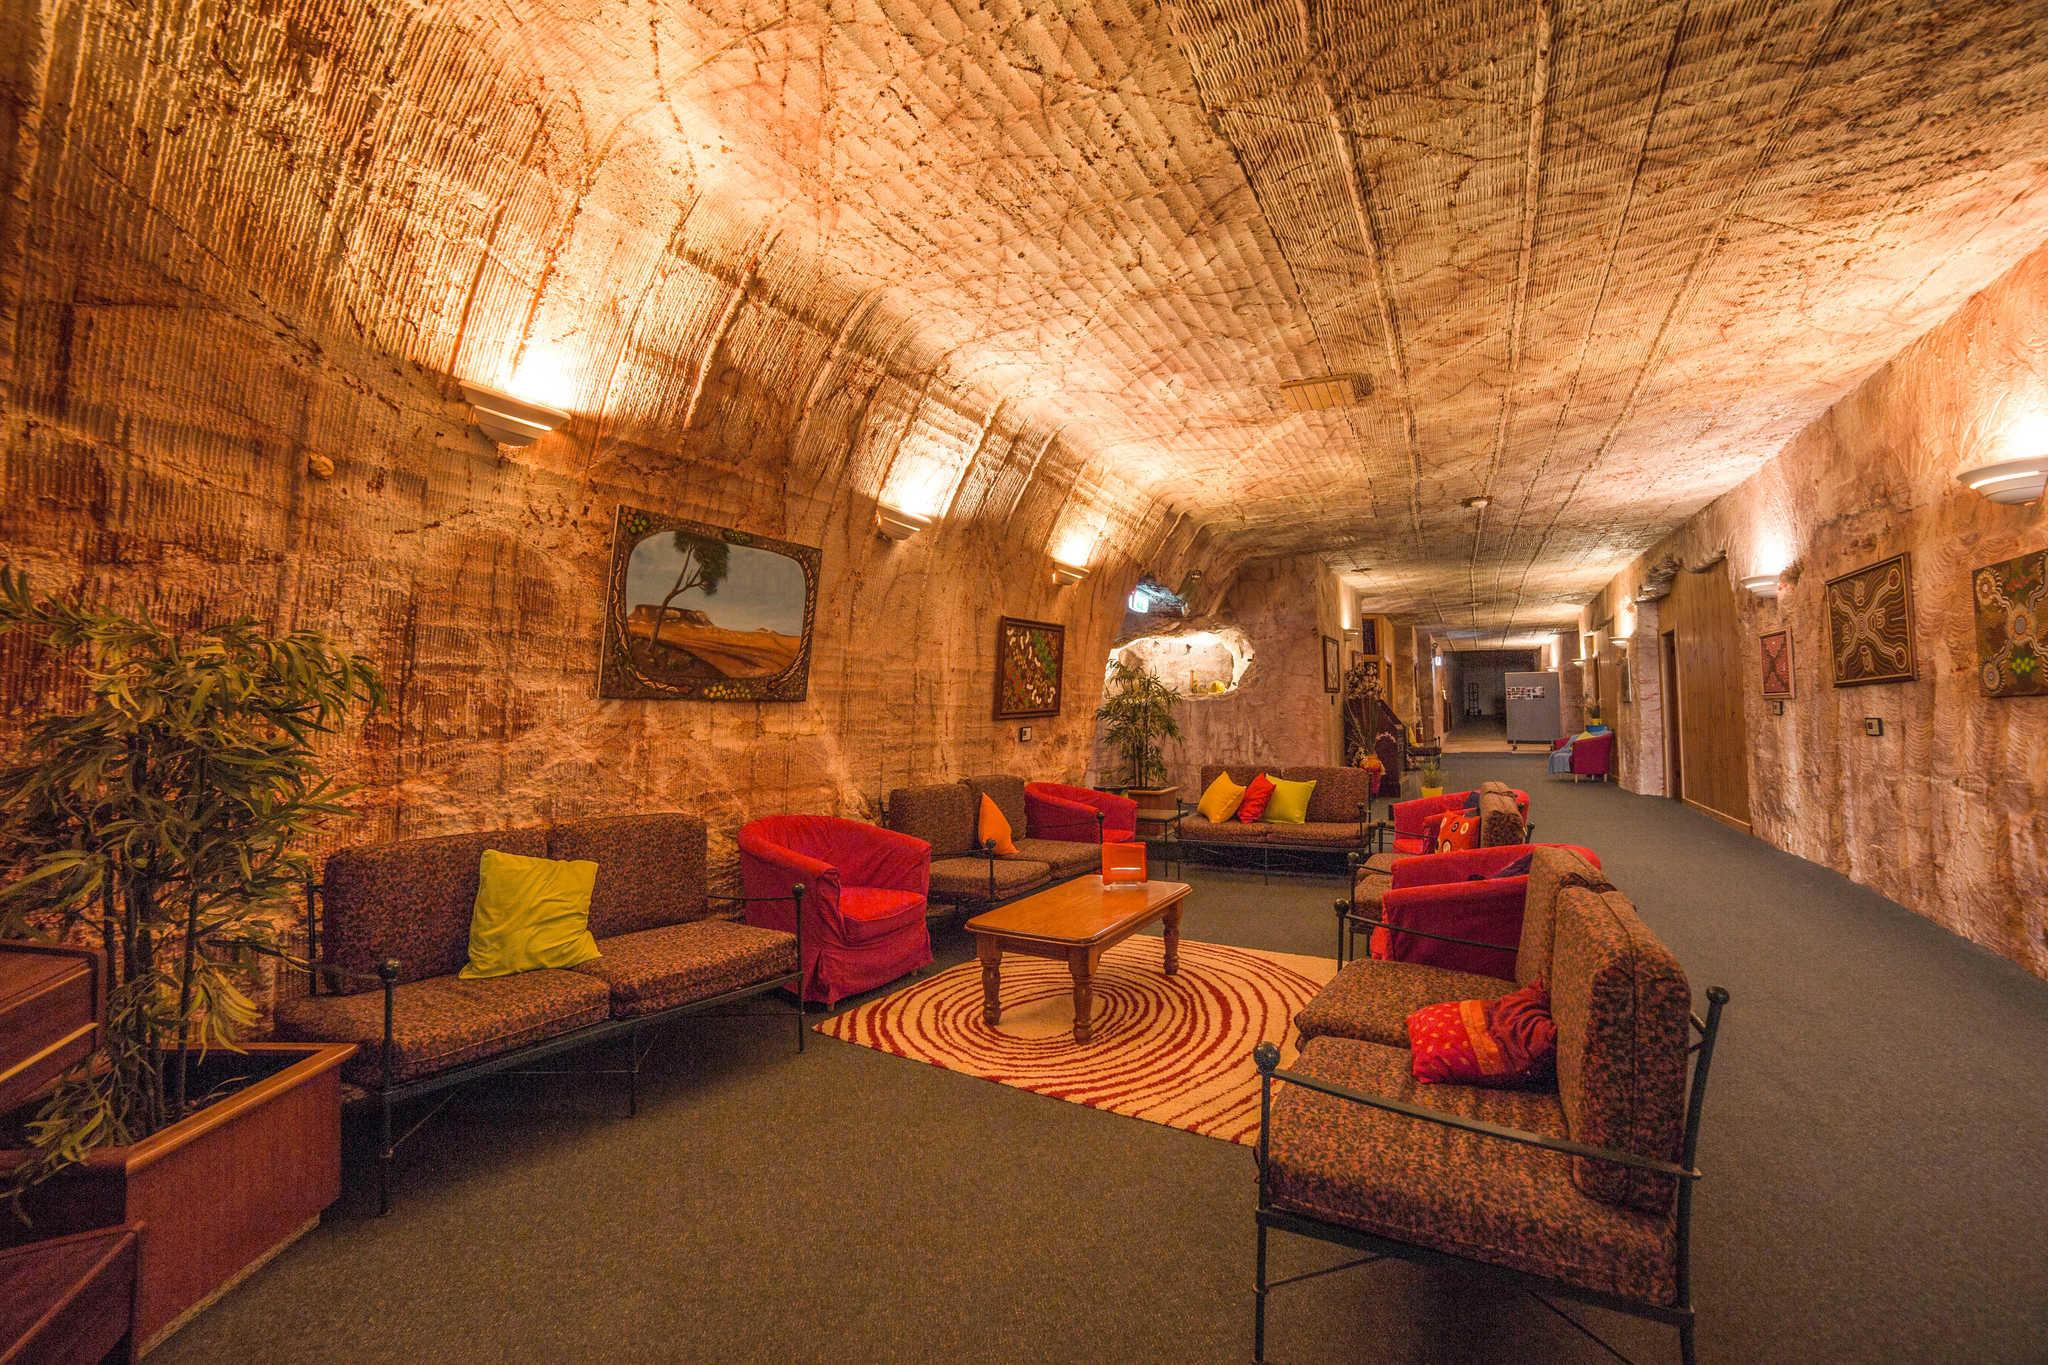 Comfort Inn Coober Pedy Experience - Coober Pedy, SA 5723 - (08) 8672 5777 | ShowMeLocal.com